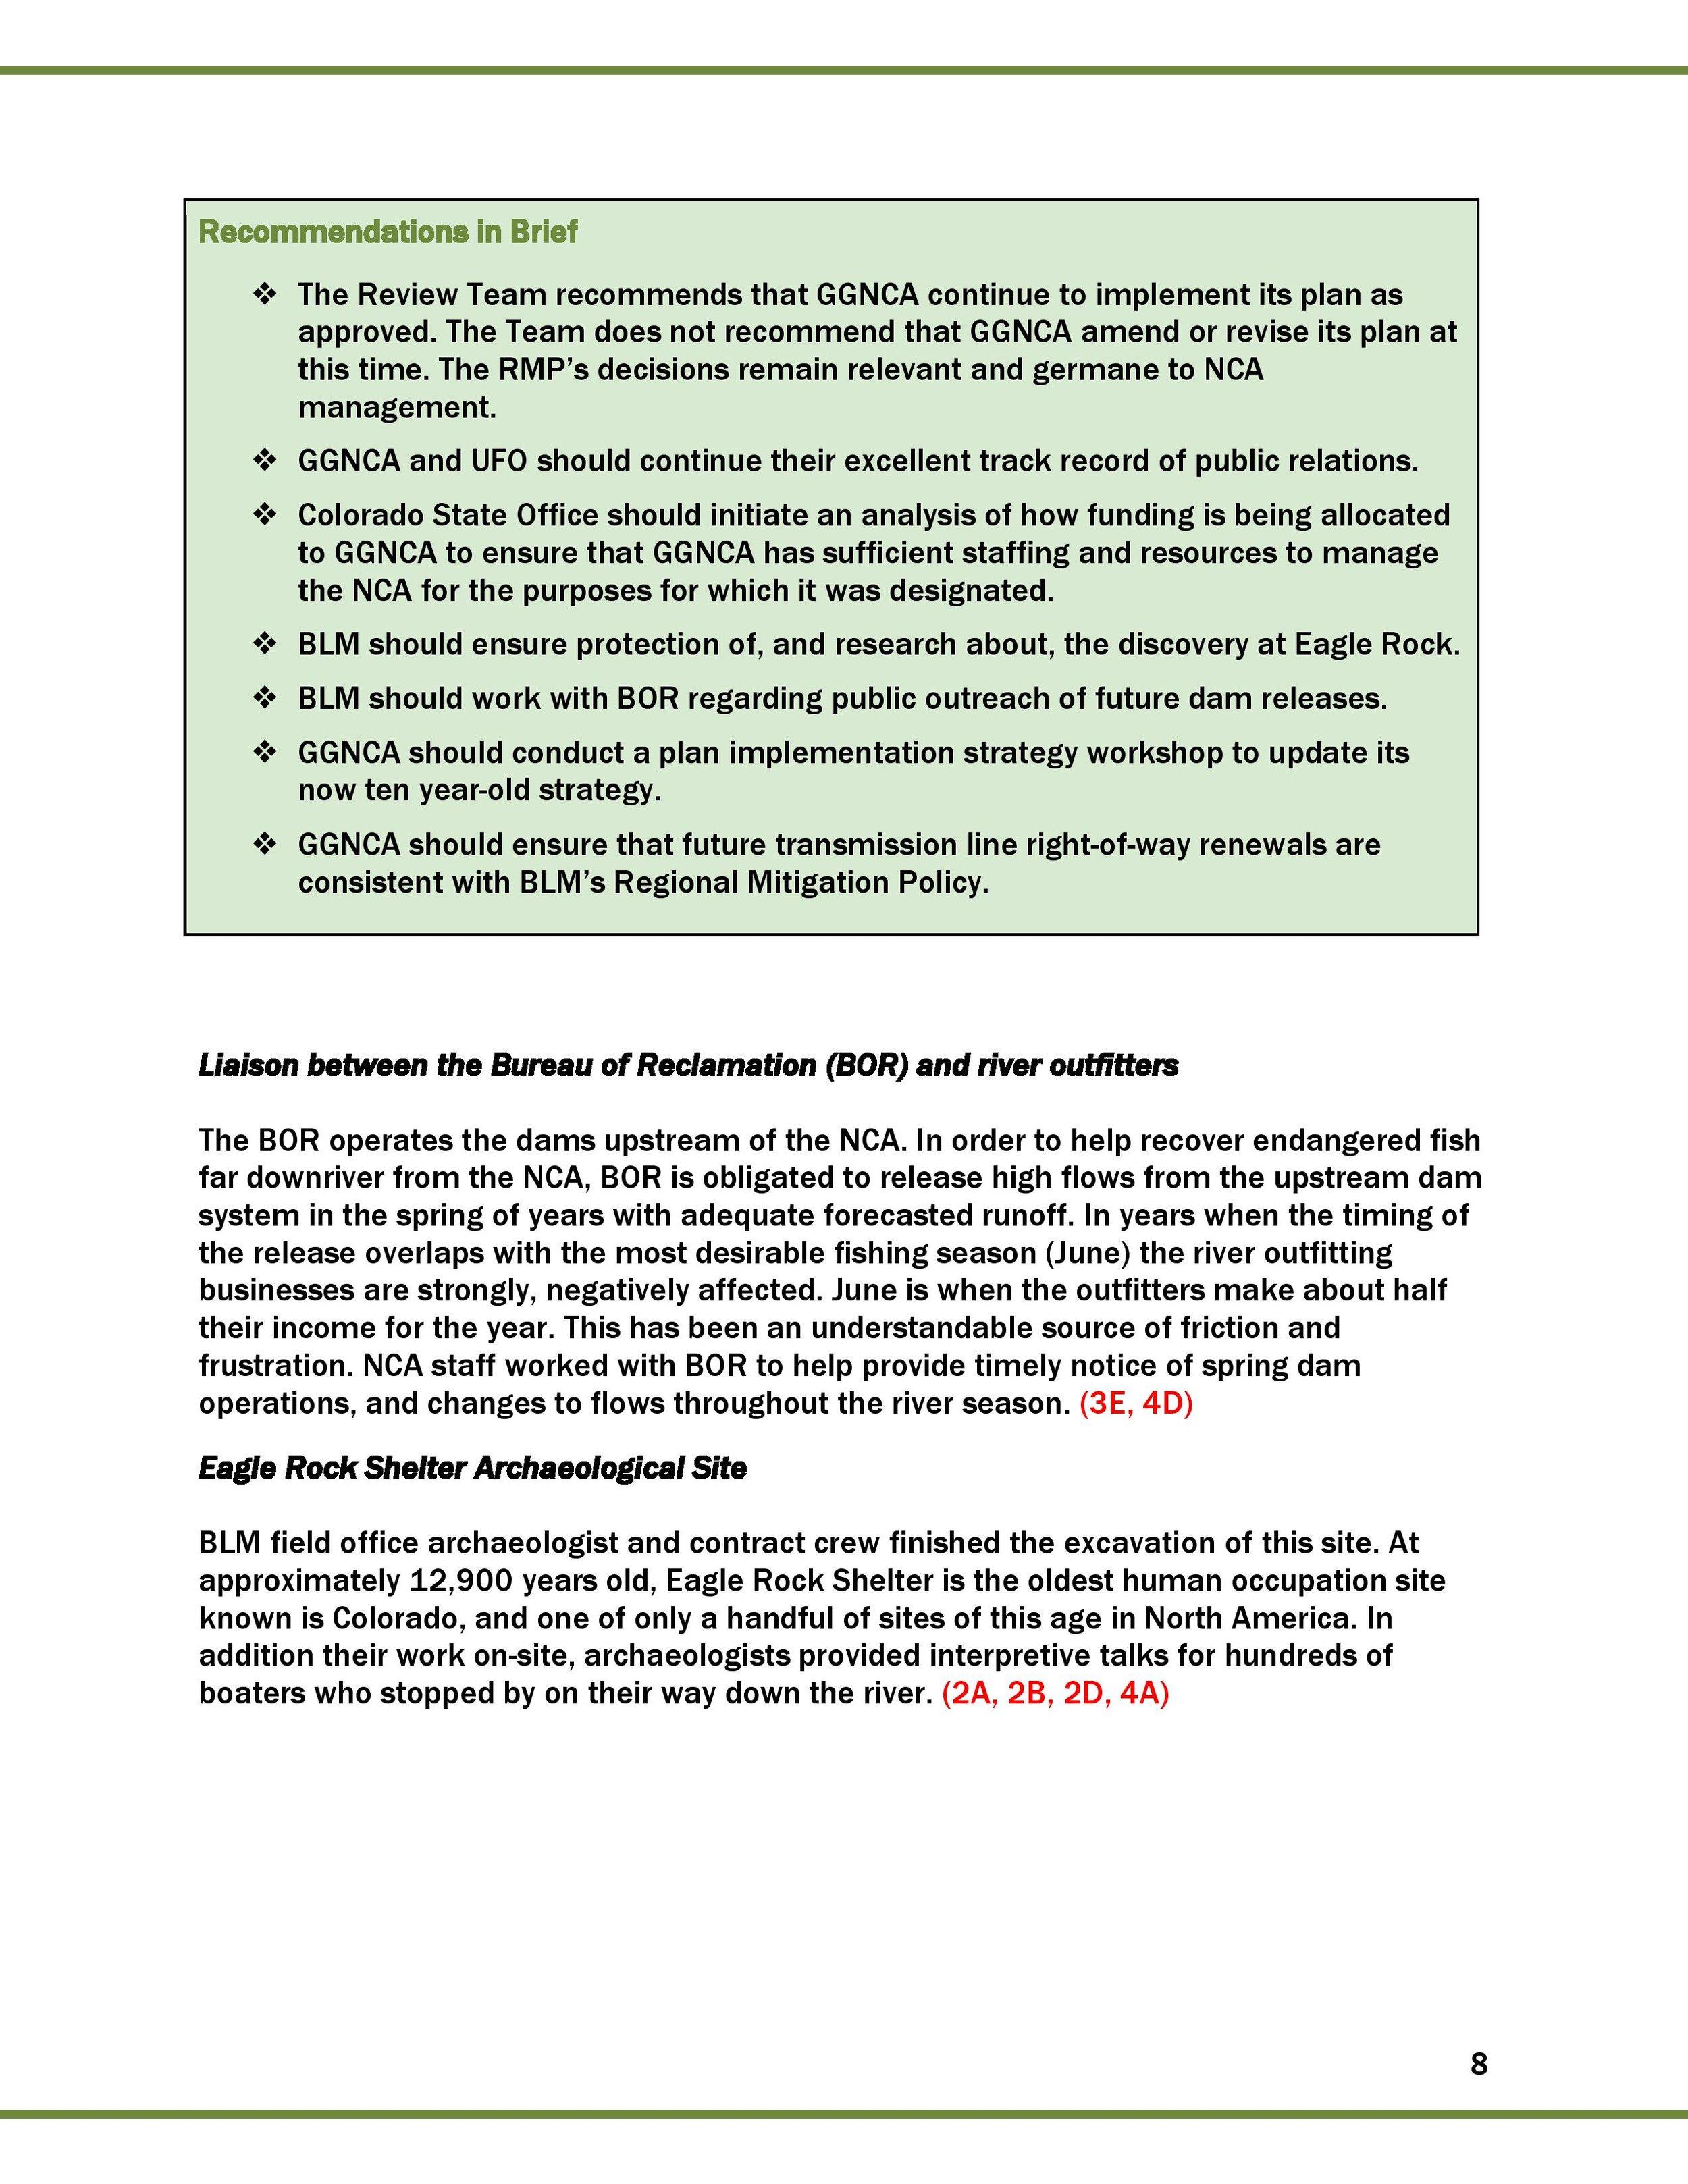 2016 FINAL GGNCA REPORT_2017_02_01-page-009.jpg